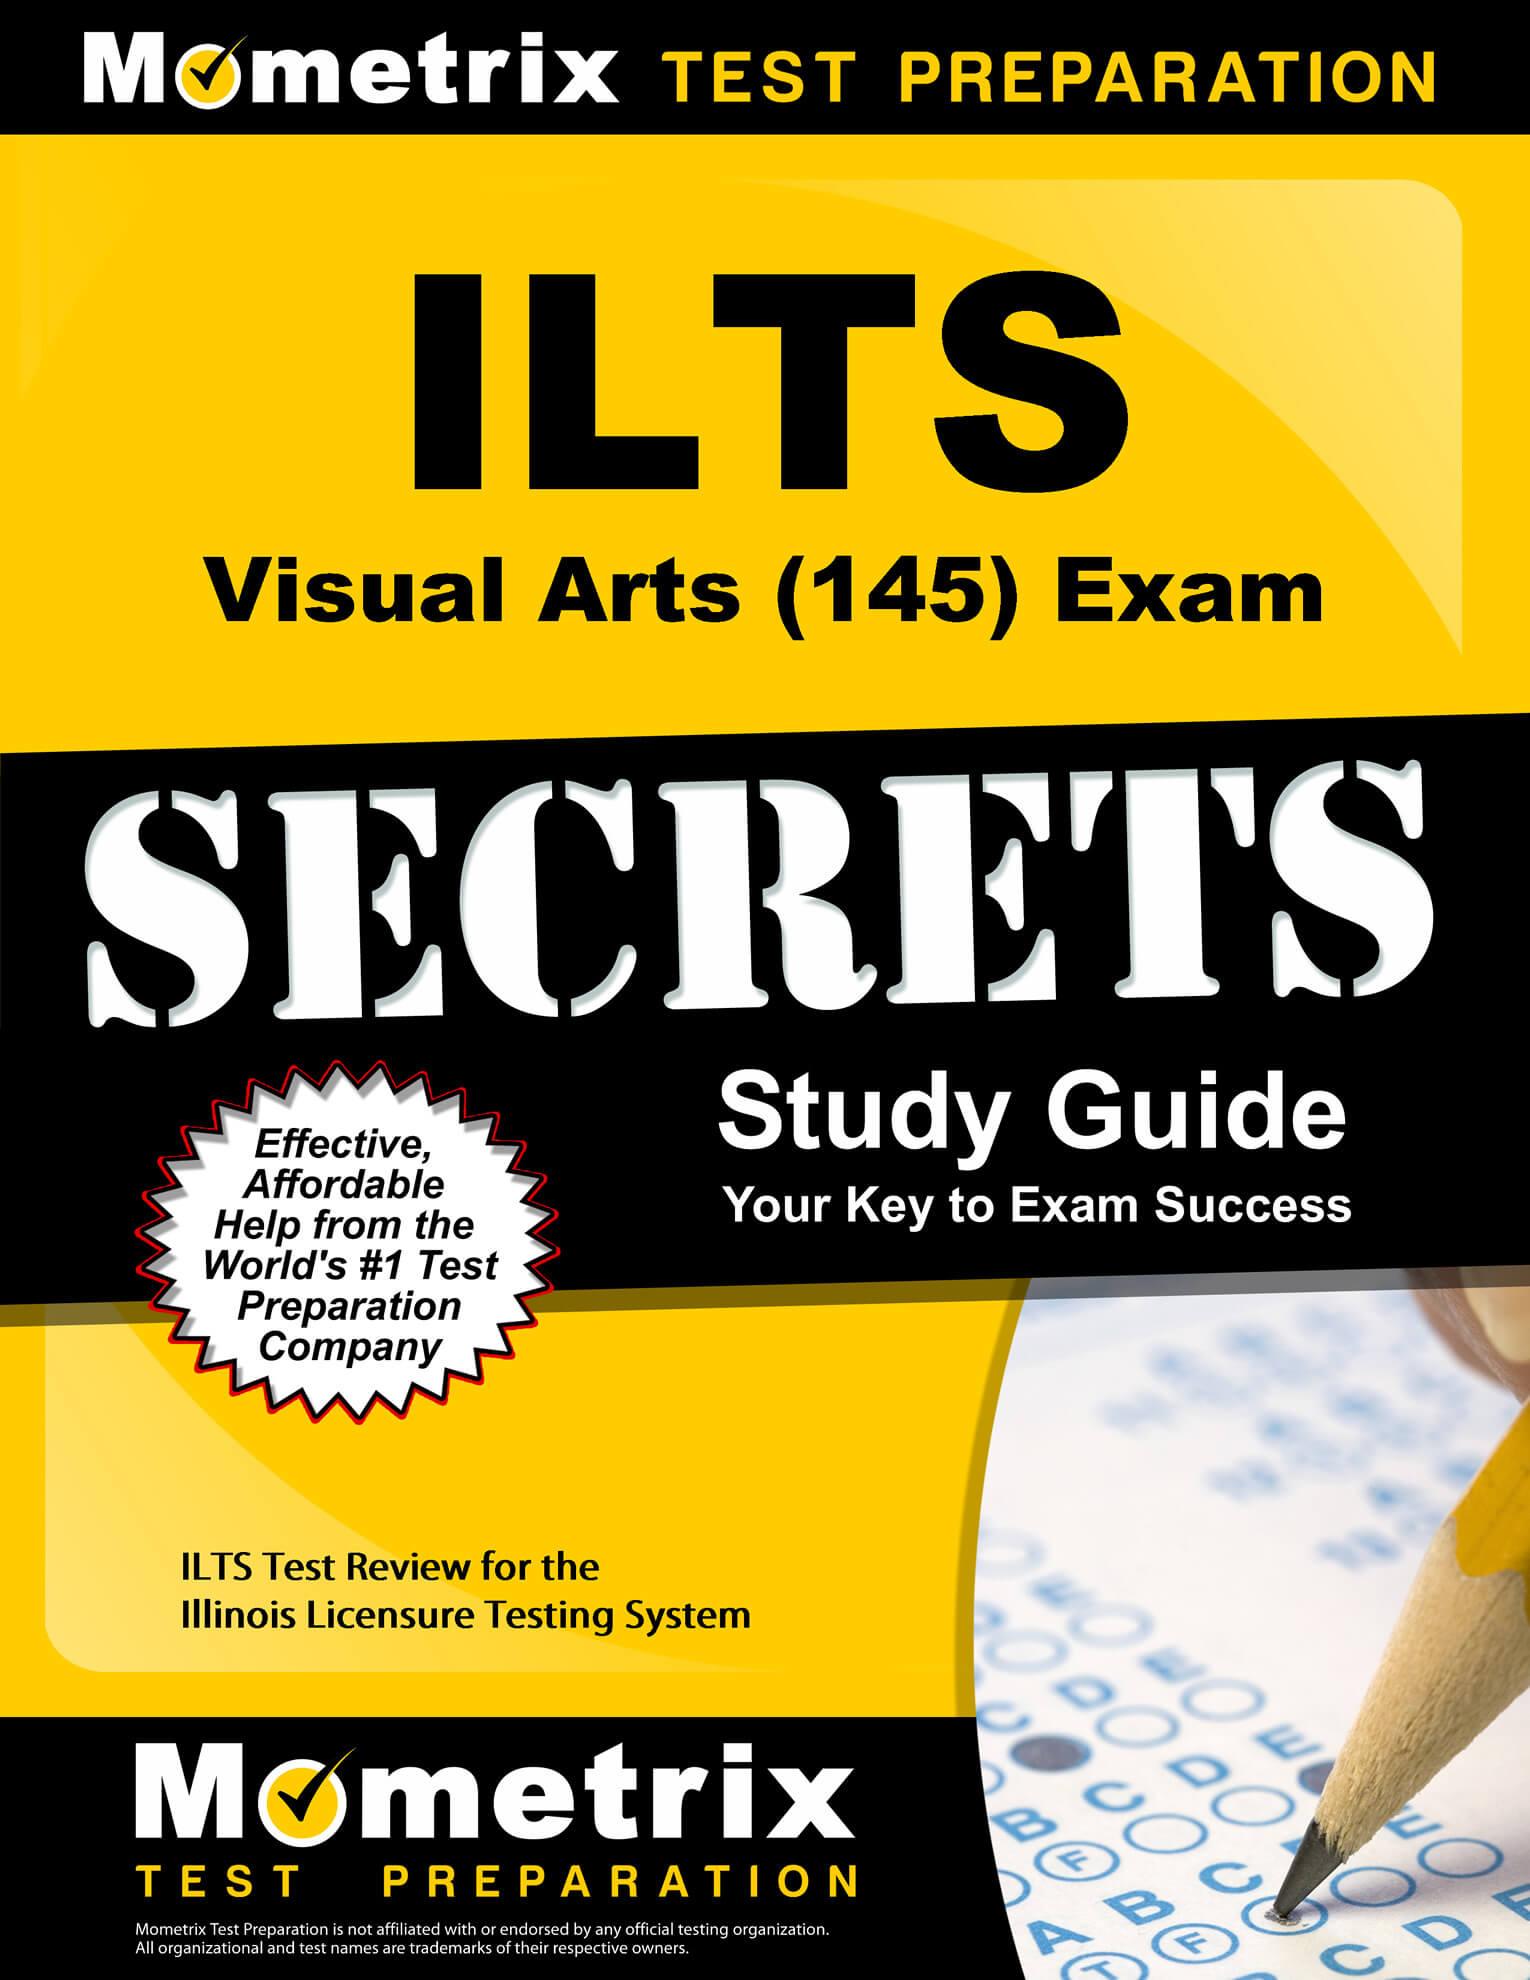 ILTS Visual Arts Study Guide